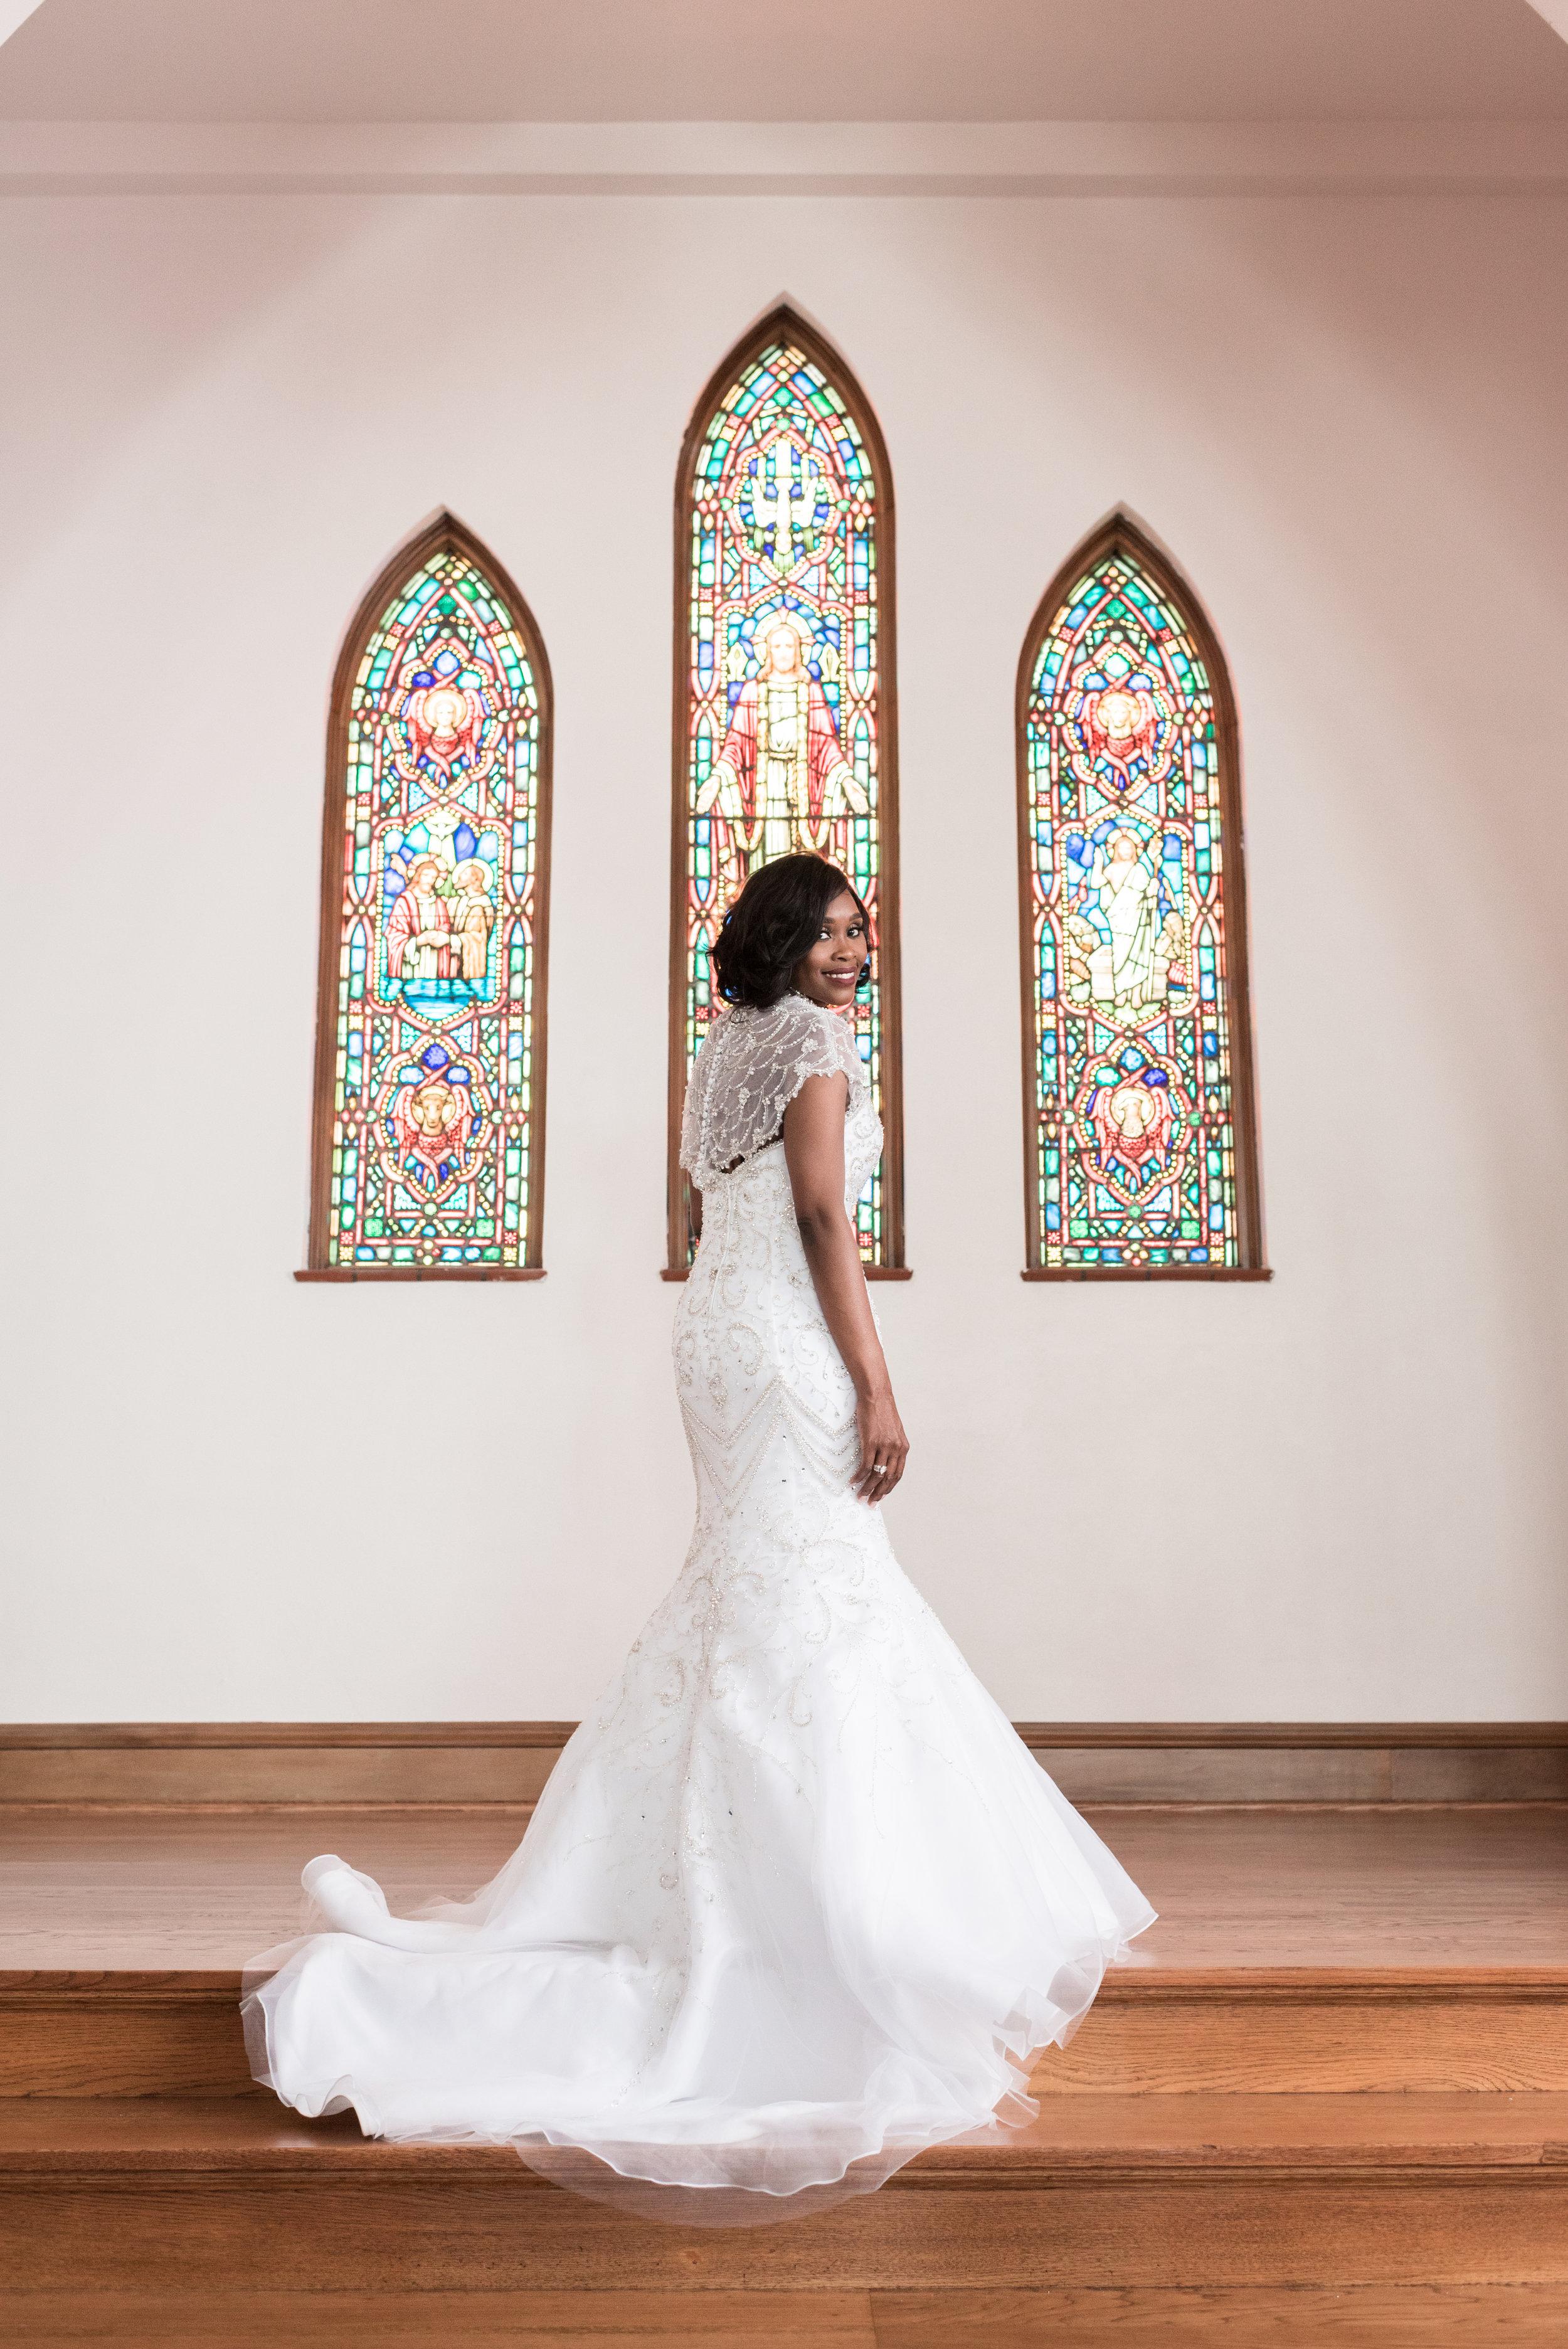 st-louis-wedding-photographer-third-baptist-church-304.jpg